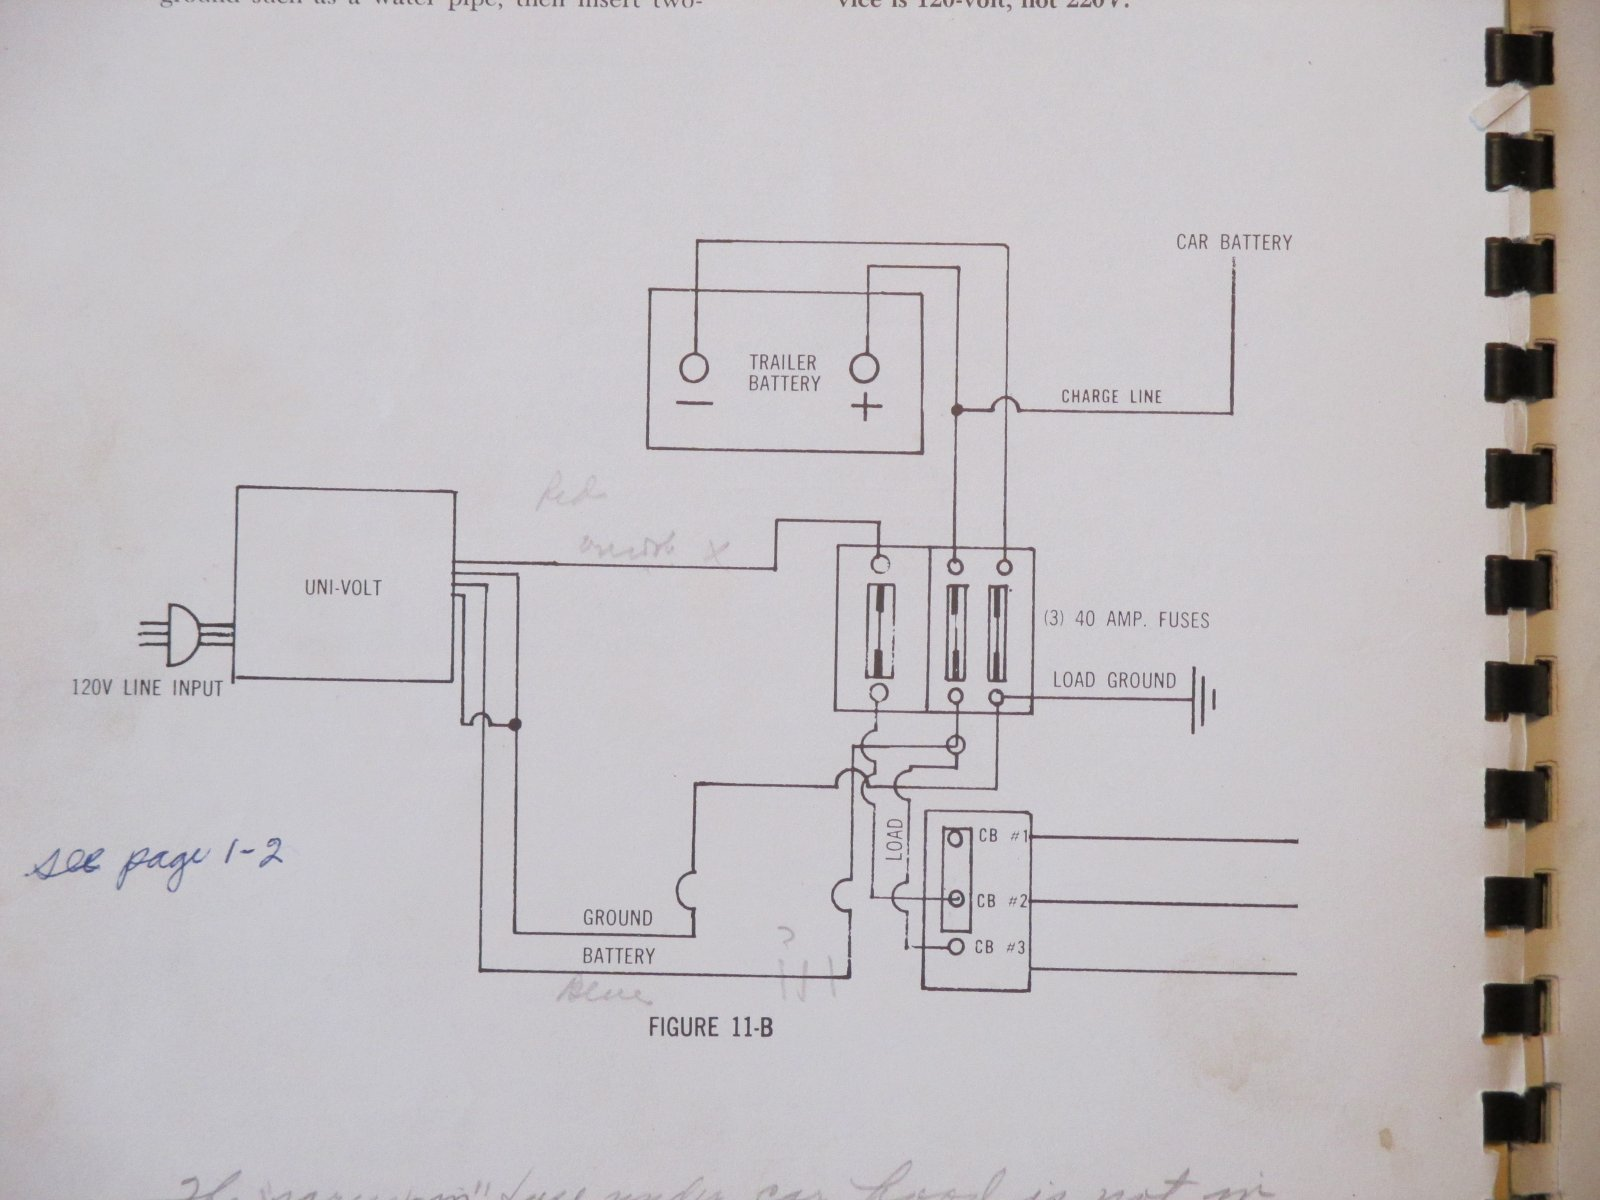 Click image for larger version  Name:1404 Univolt Wiring Diagram.jpg Views:128 Size:180.7 KB ID:224871